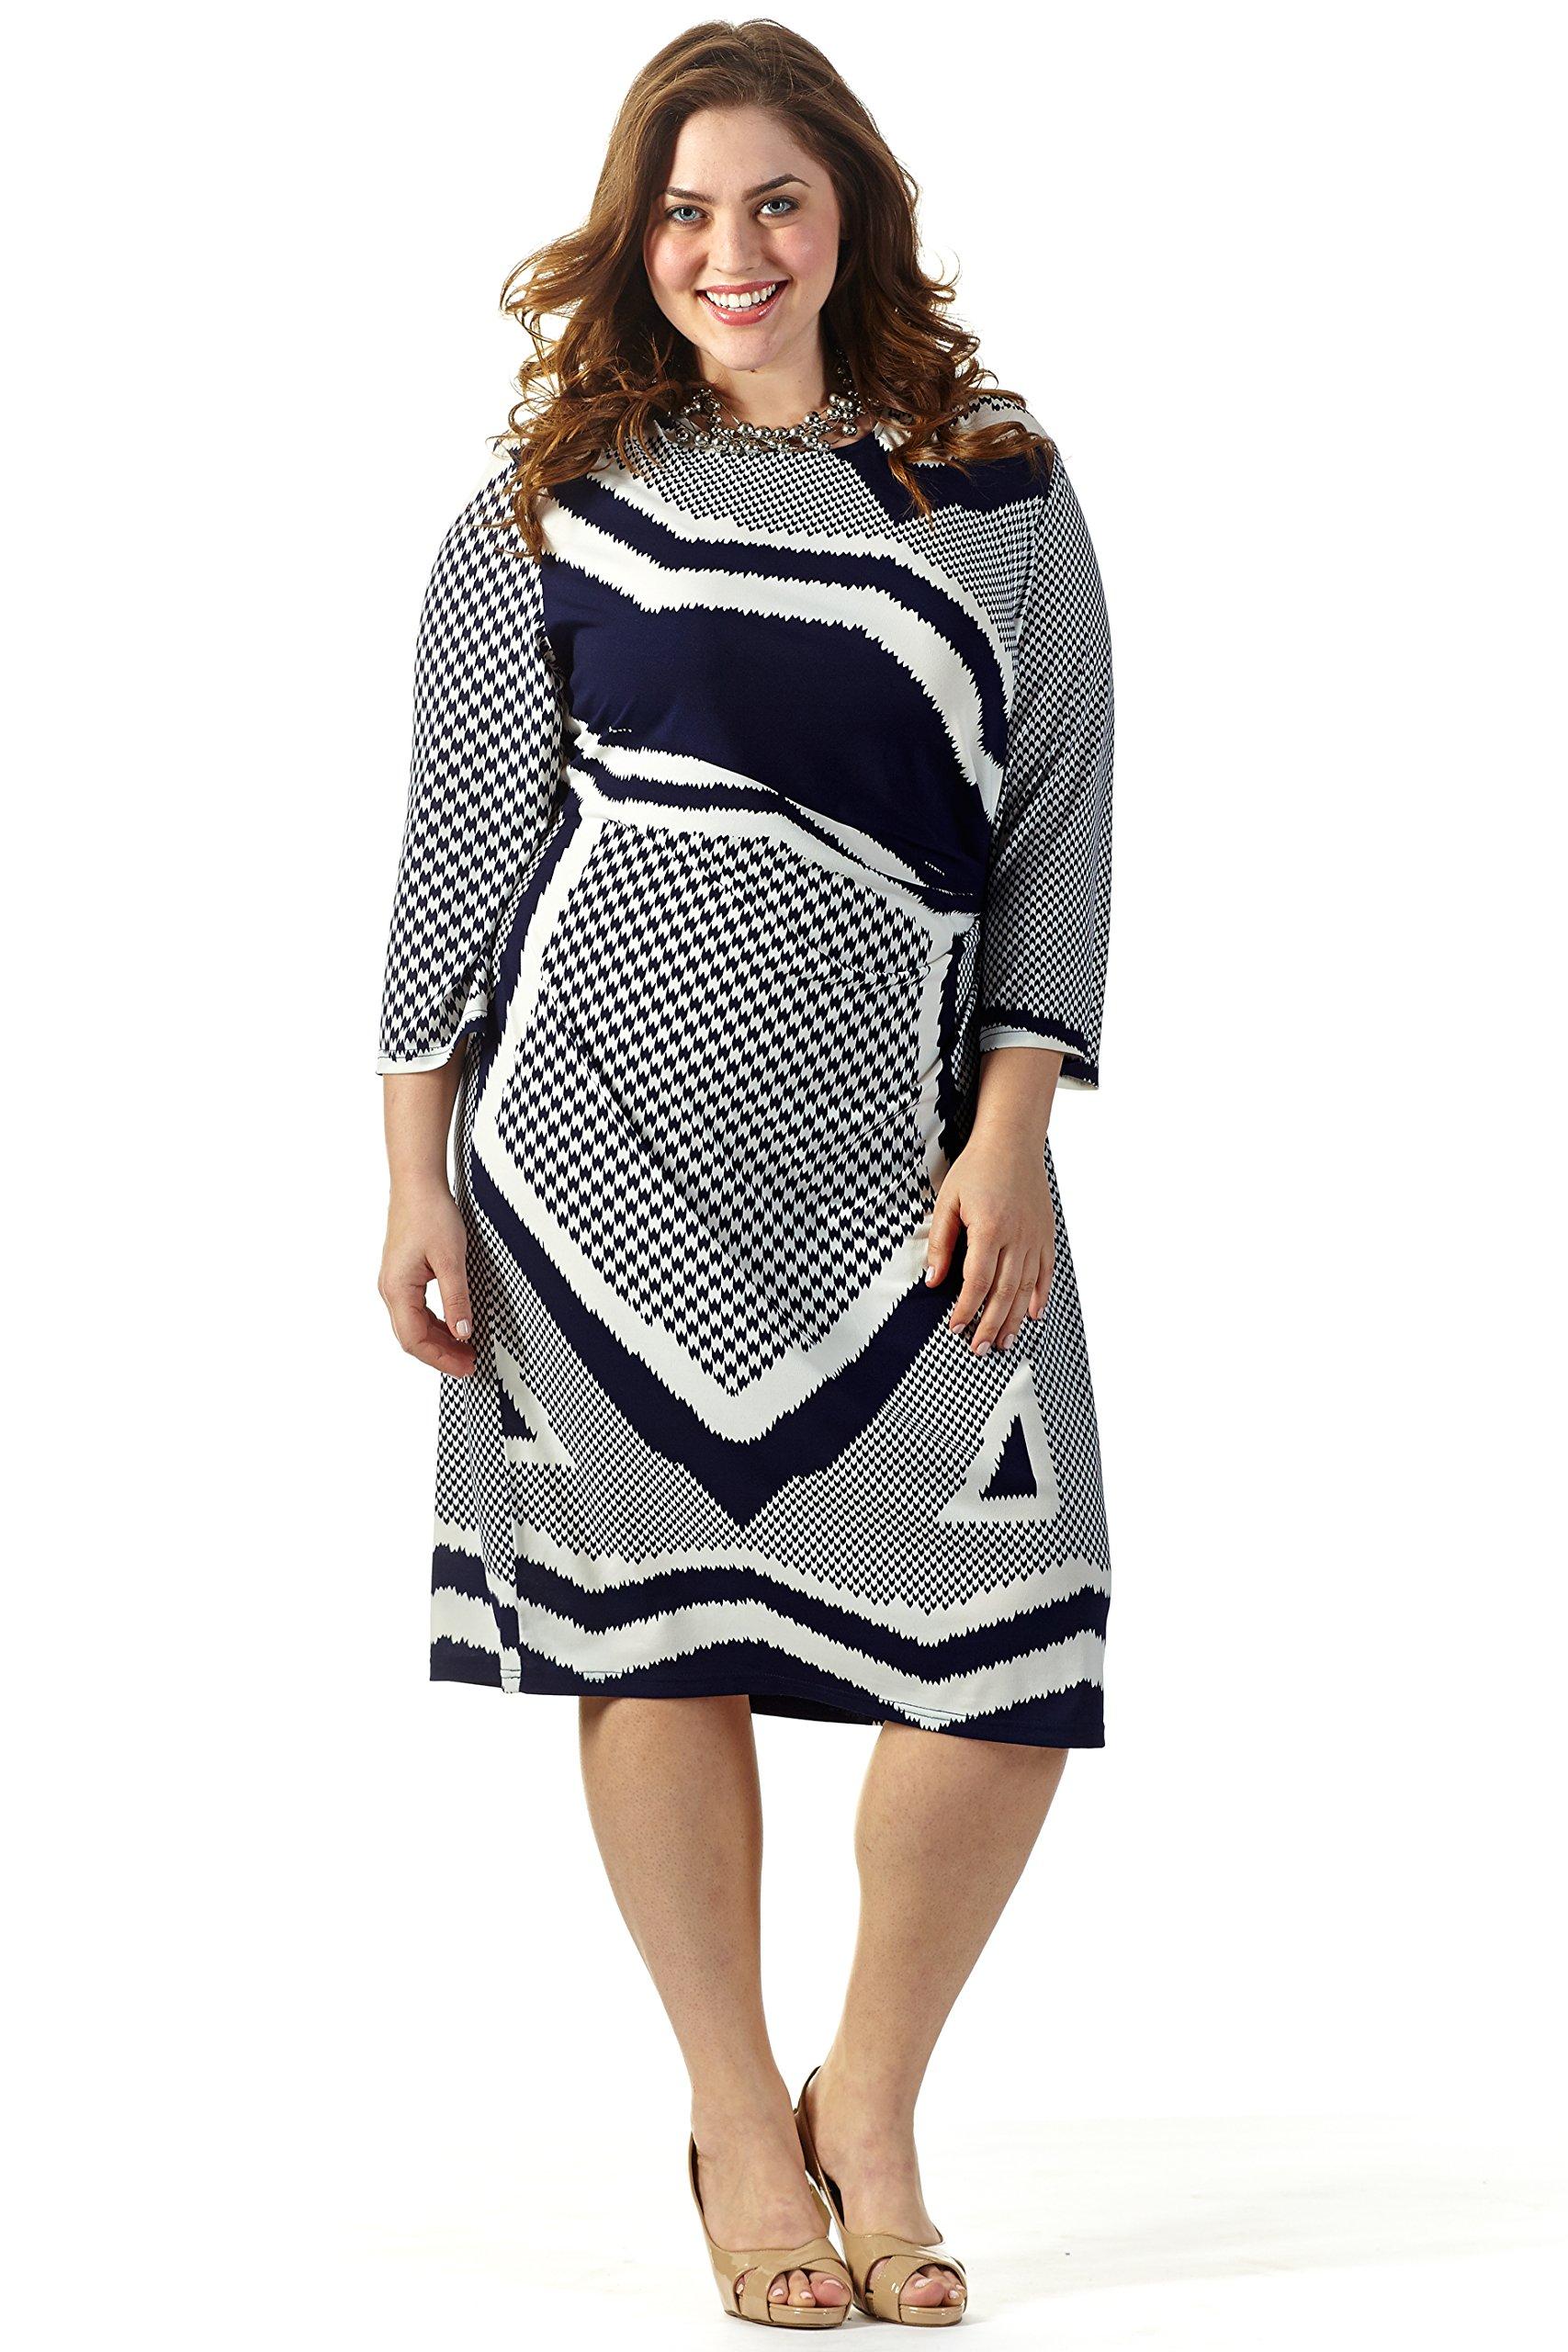 Celebrations Women's Plus Size Good Vibes Dress 16 Navy/Cream Print